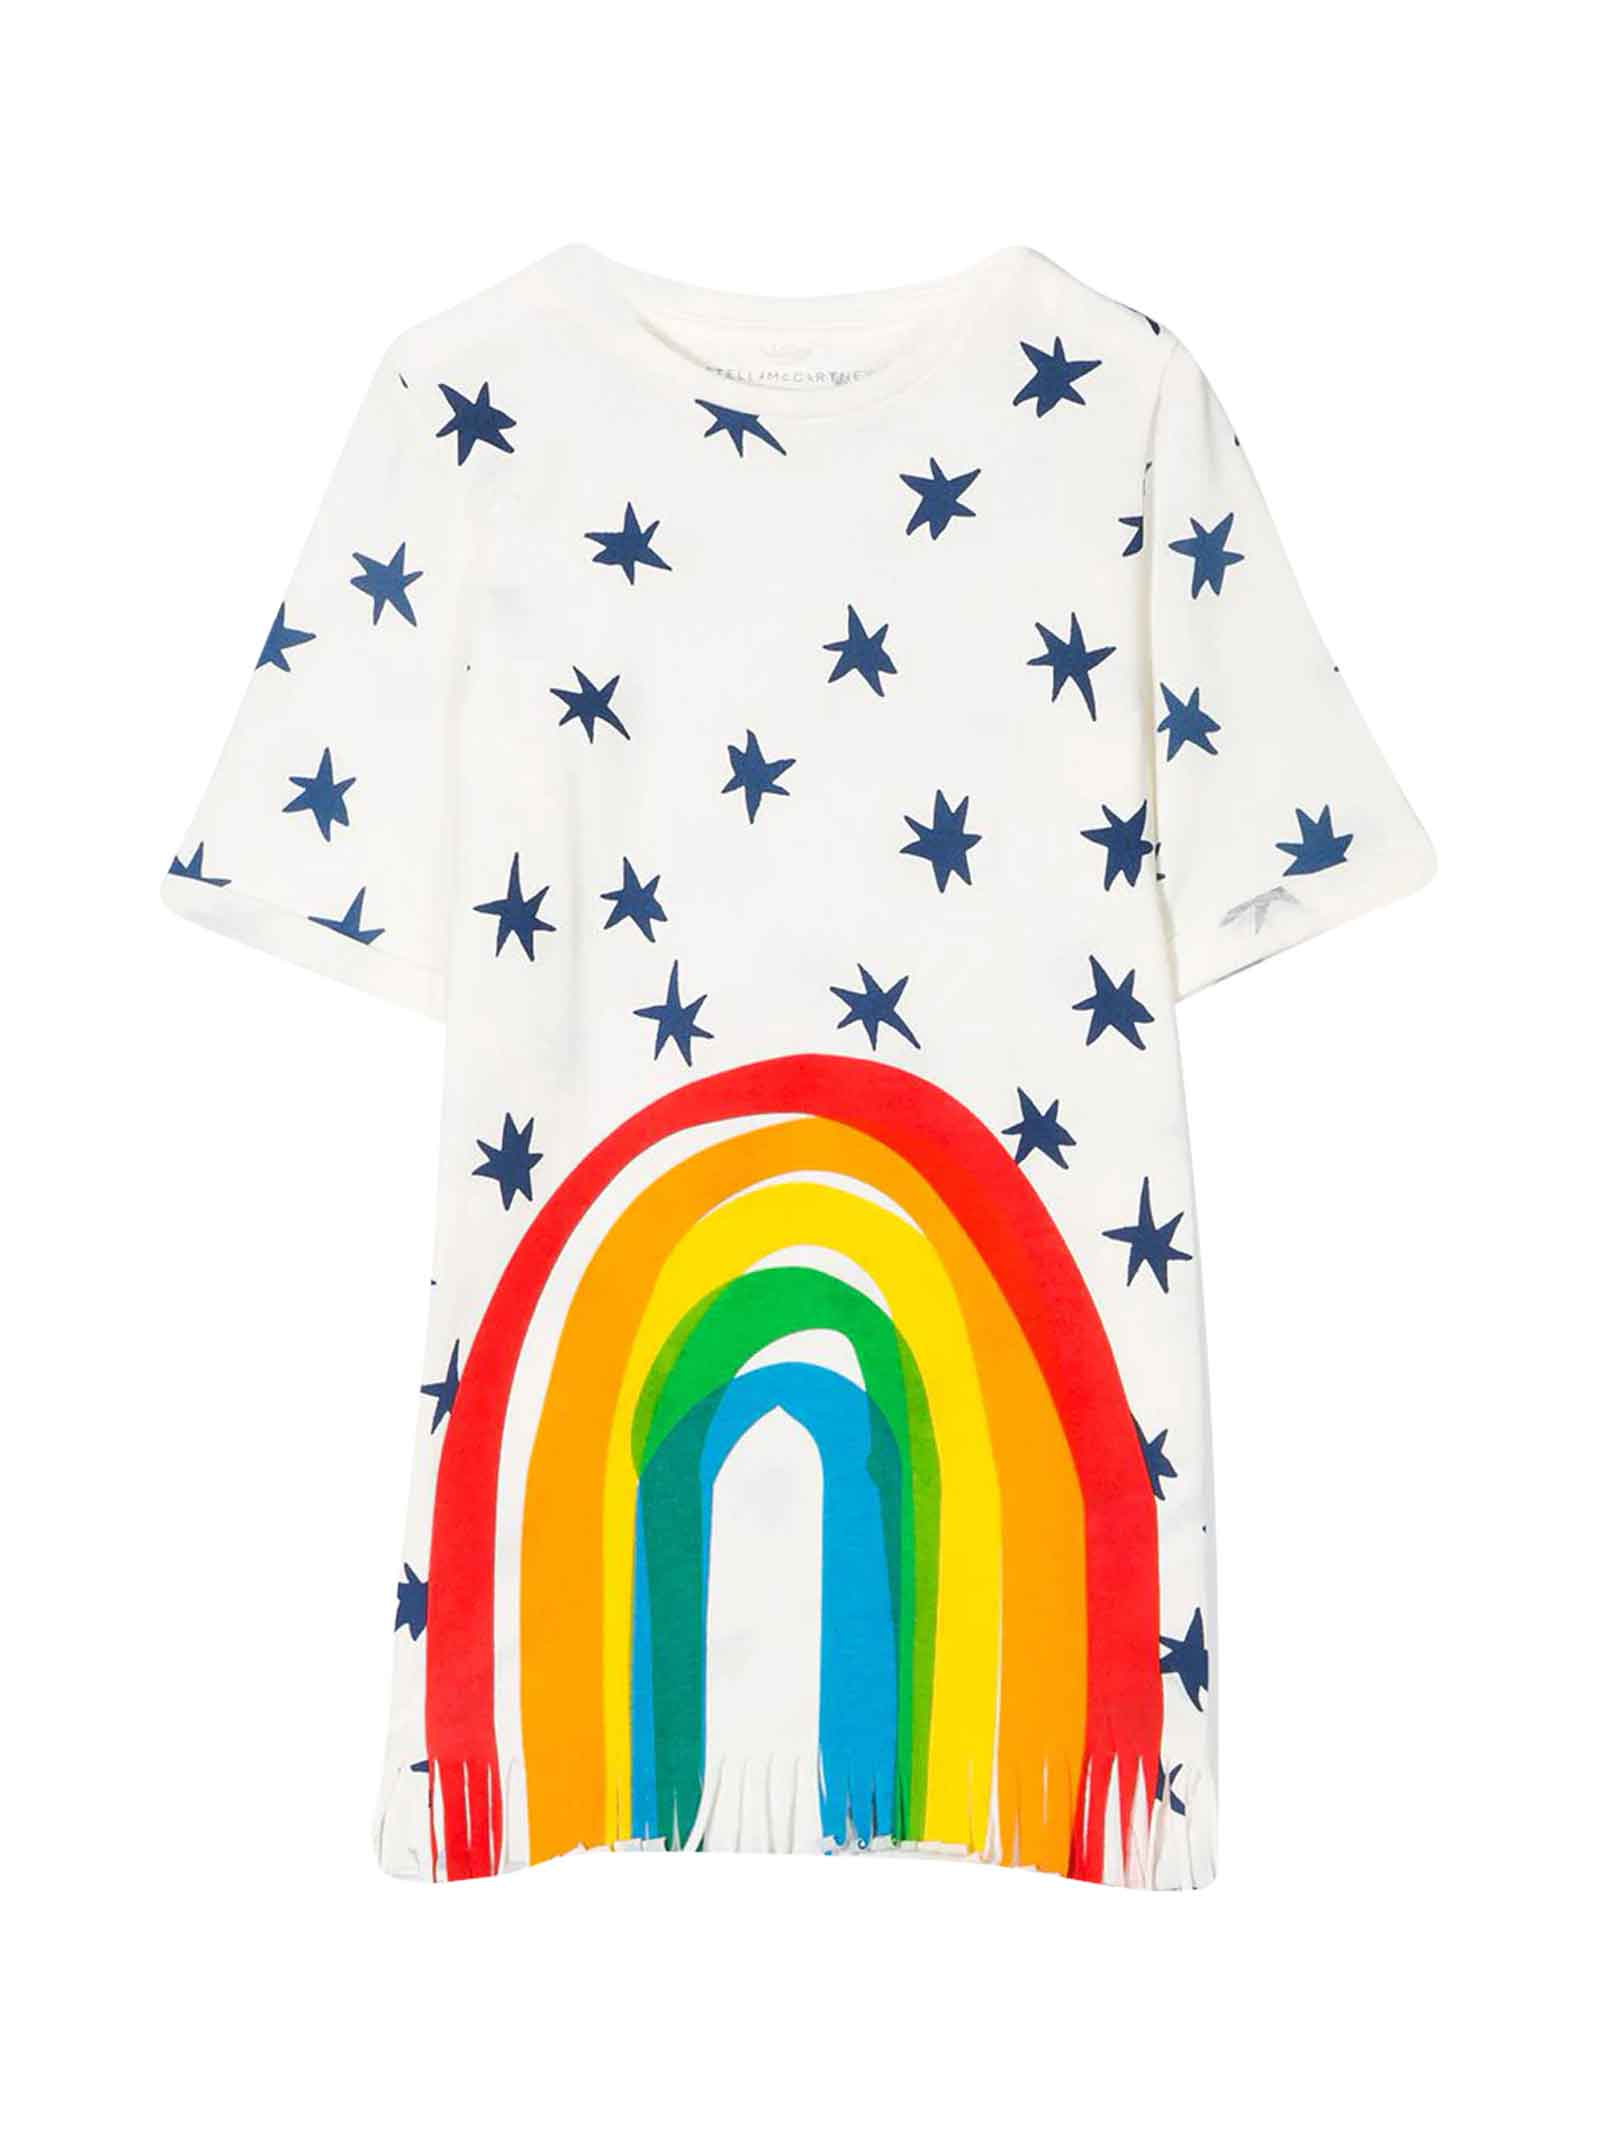 Buy Stella McCartney Kids White Teen Dress With Colored Press online, shop Stella McCartney Kids with free shipping